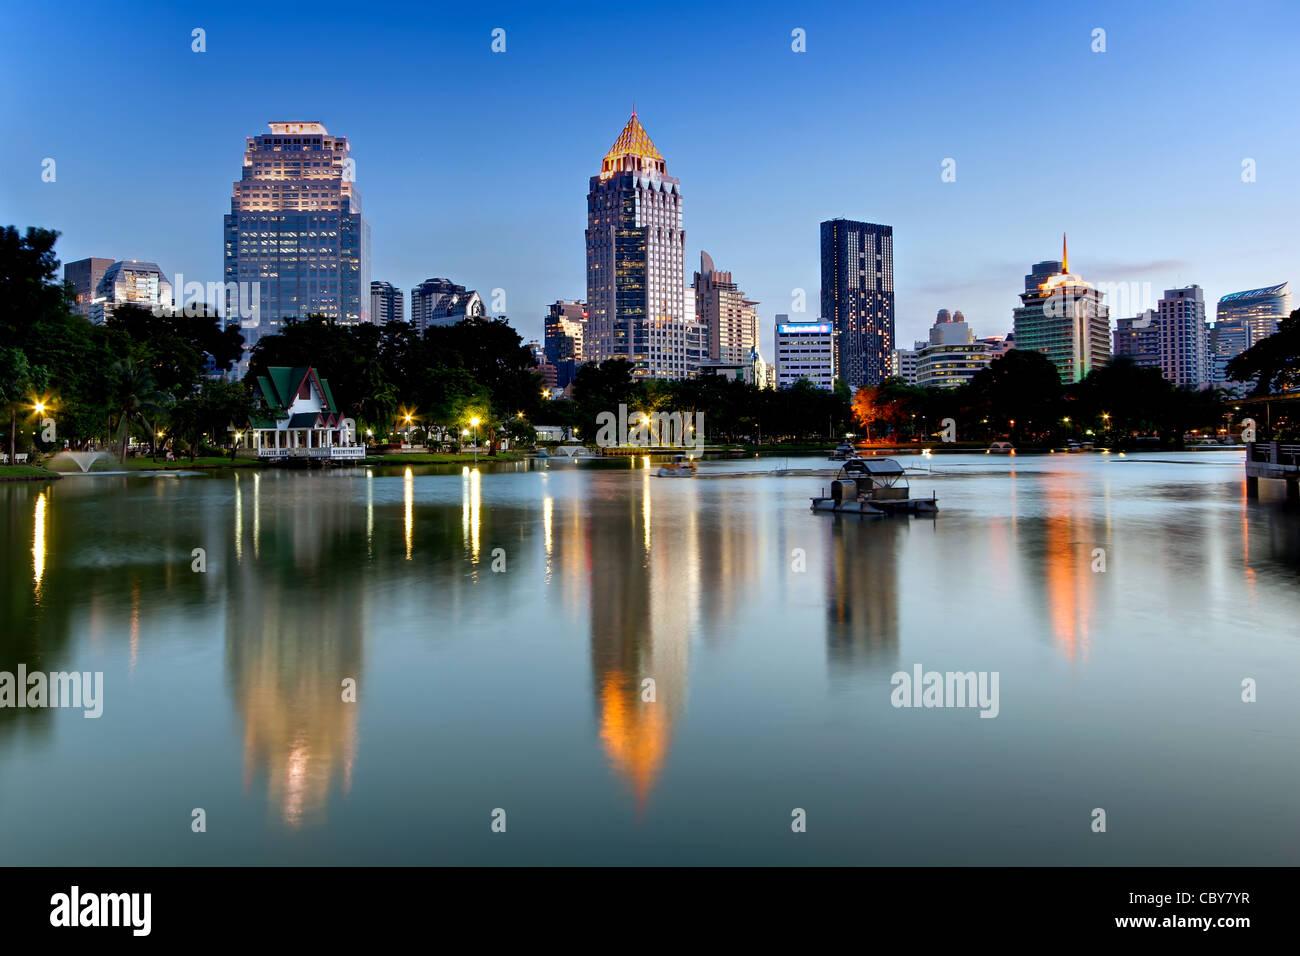 Vista in direzione di Silom & Rama IV Road da Lumpini Park al crepuscolo, Bangkok. Immagini Stock